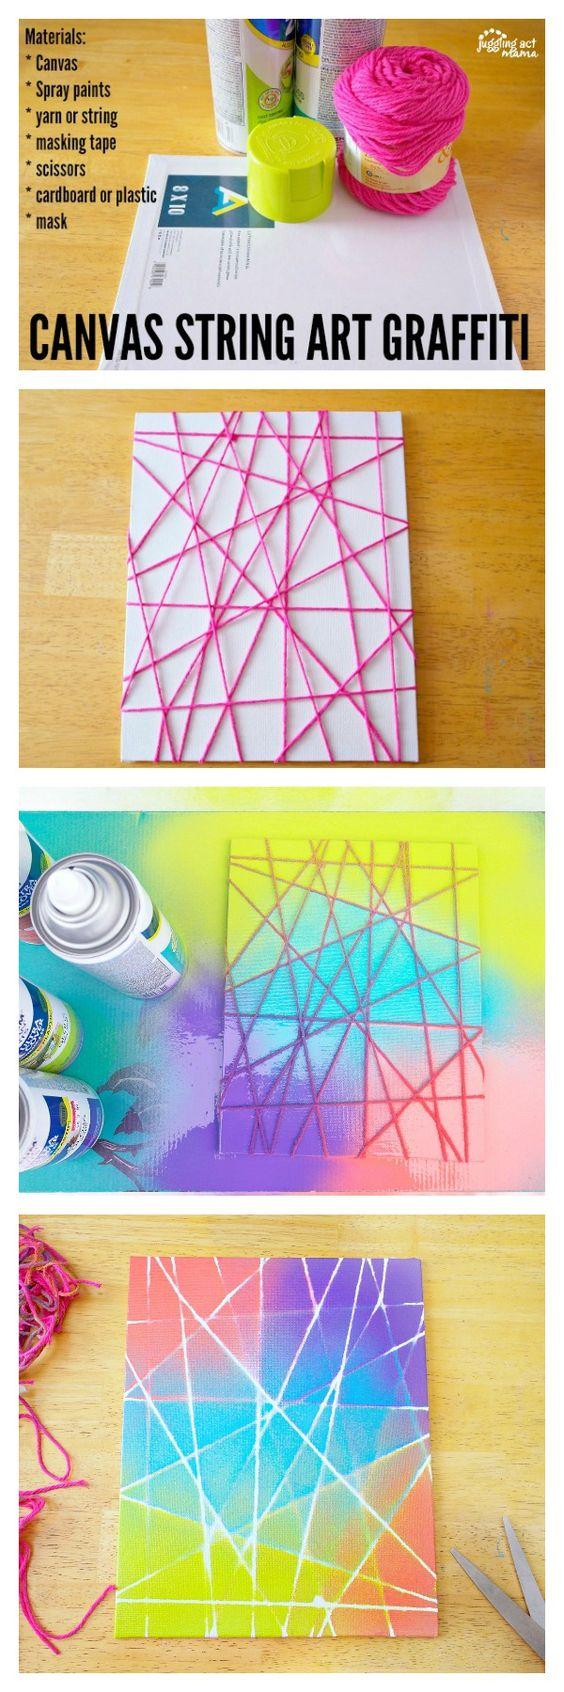 Canvas String Art Graffiti.